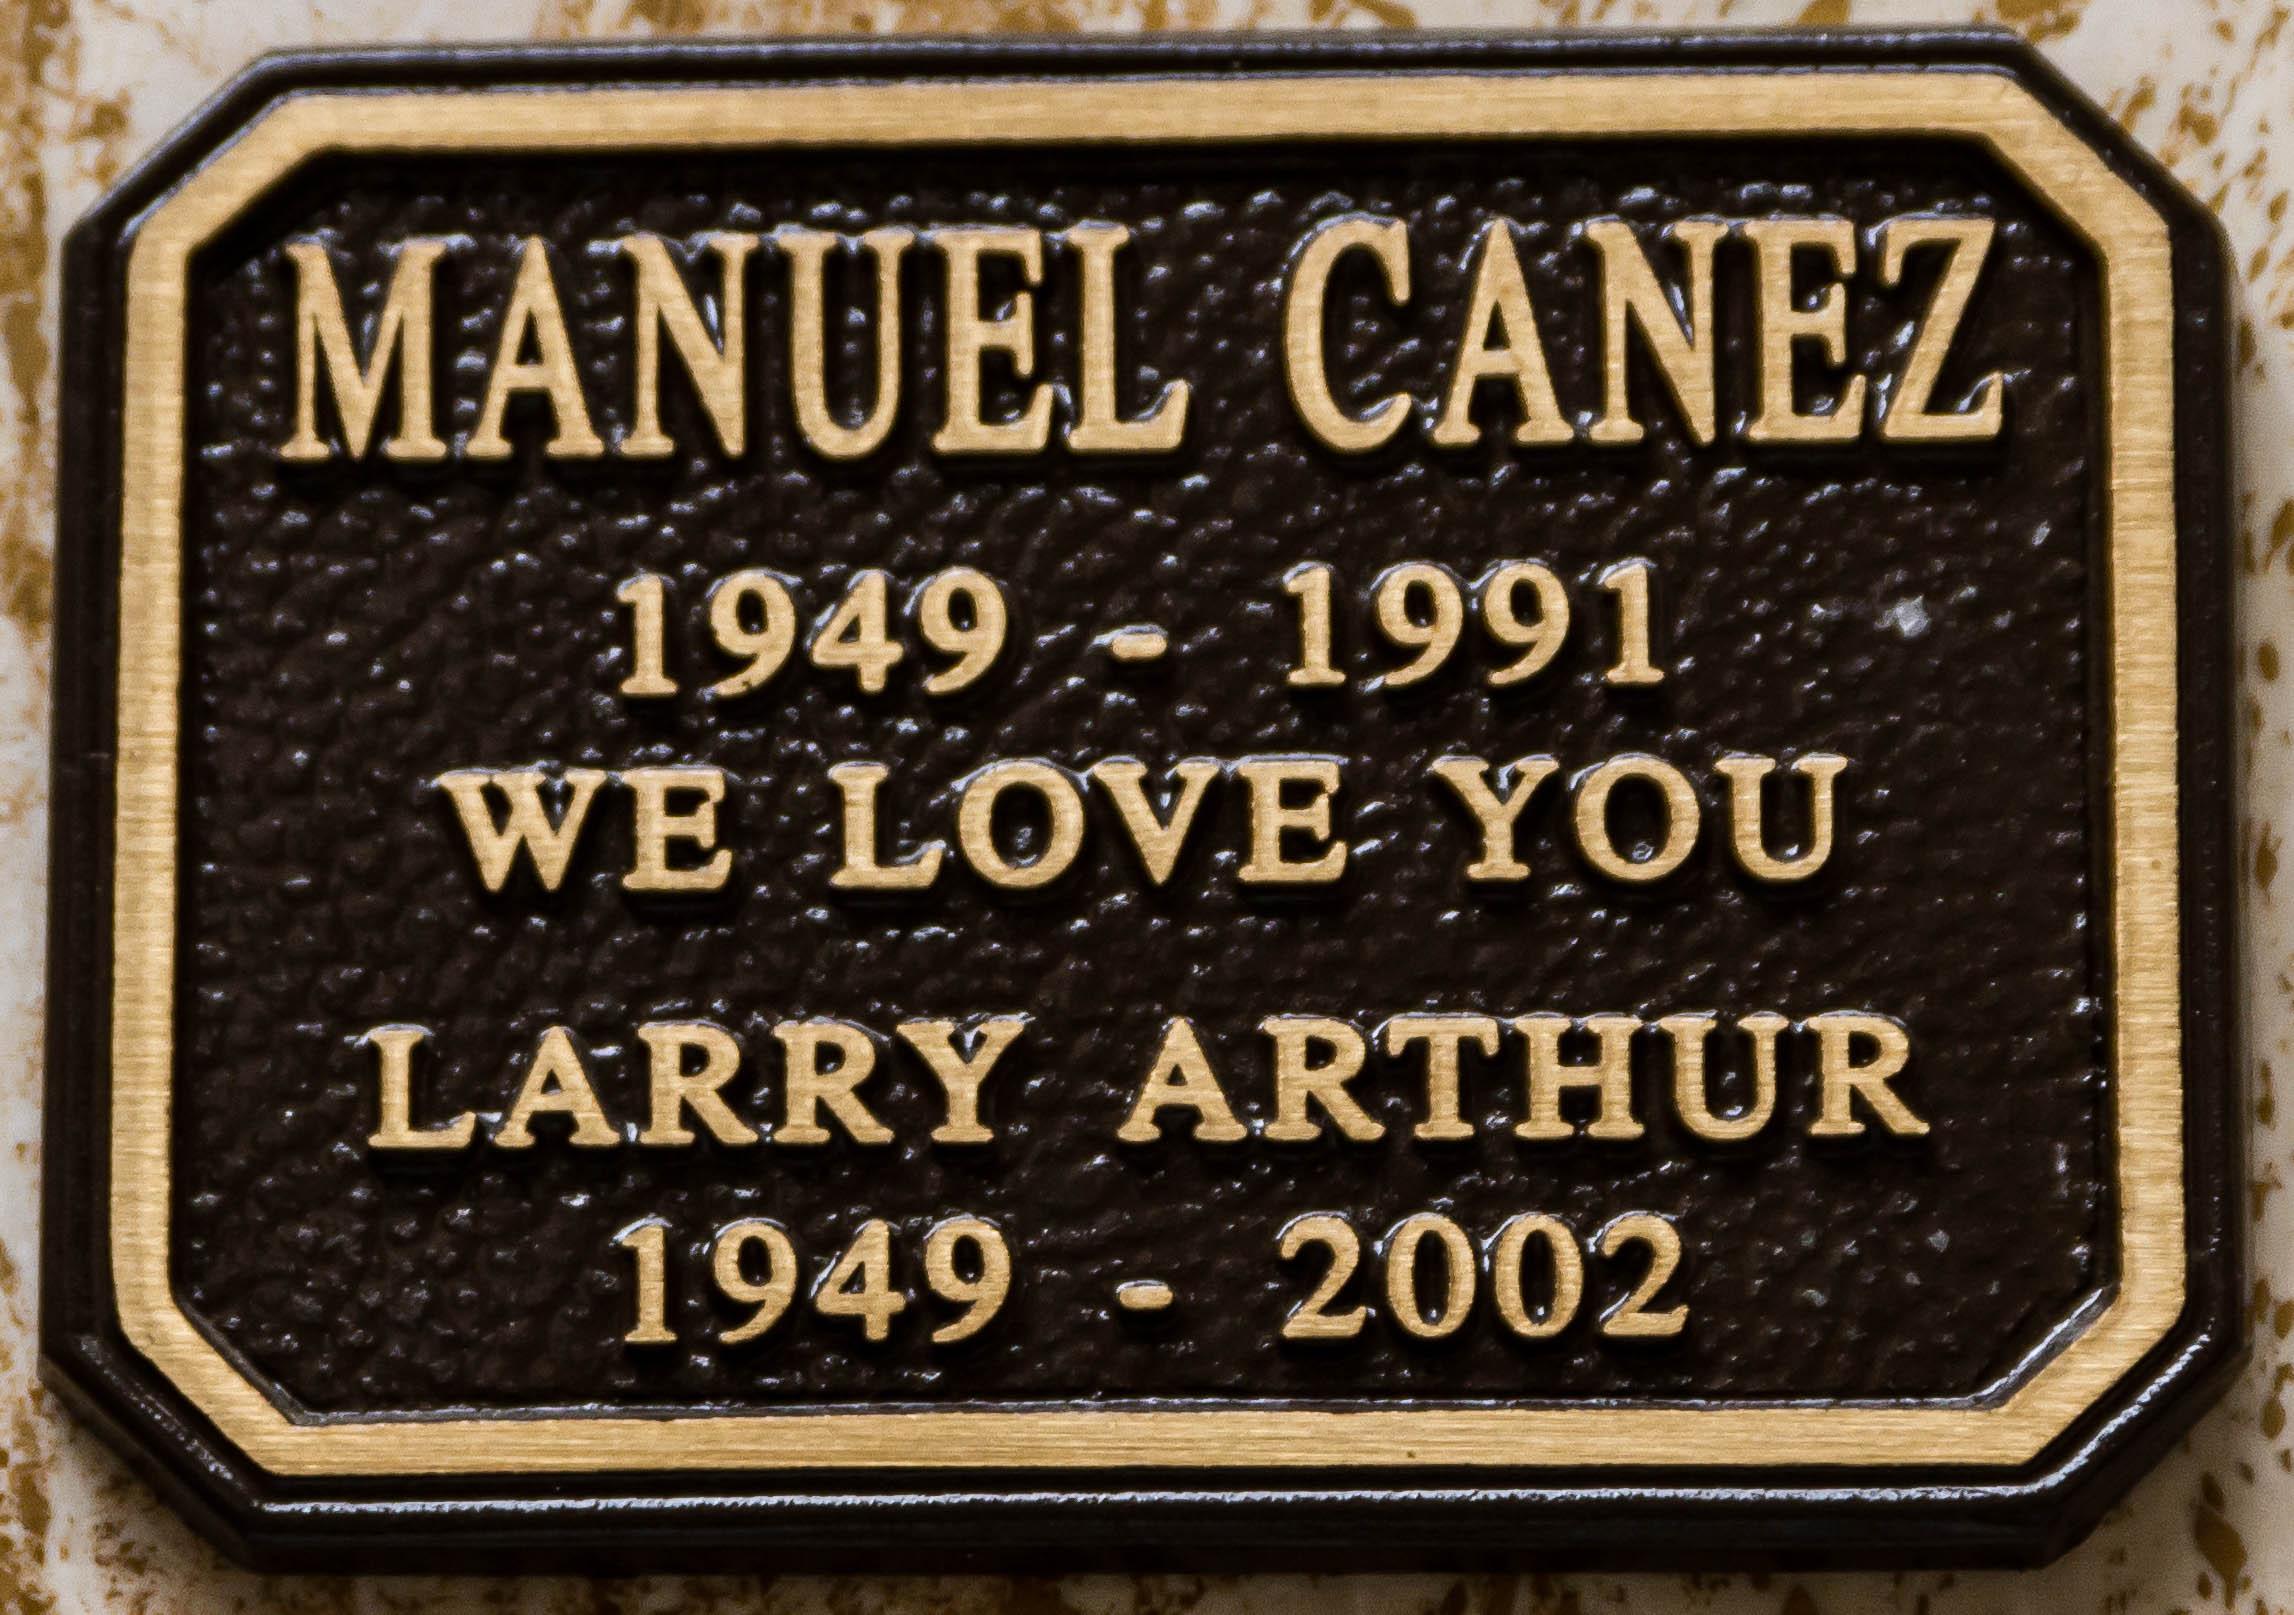 Larry Arthur